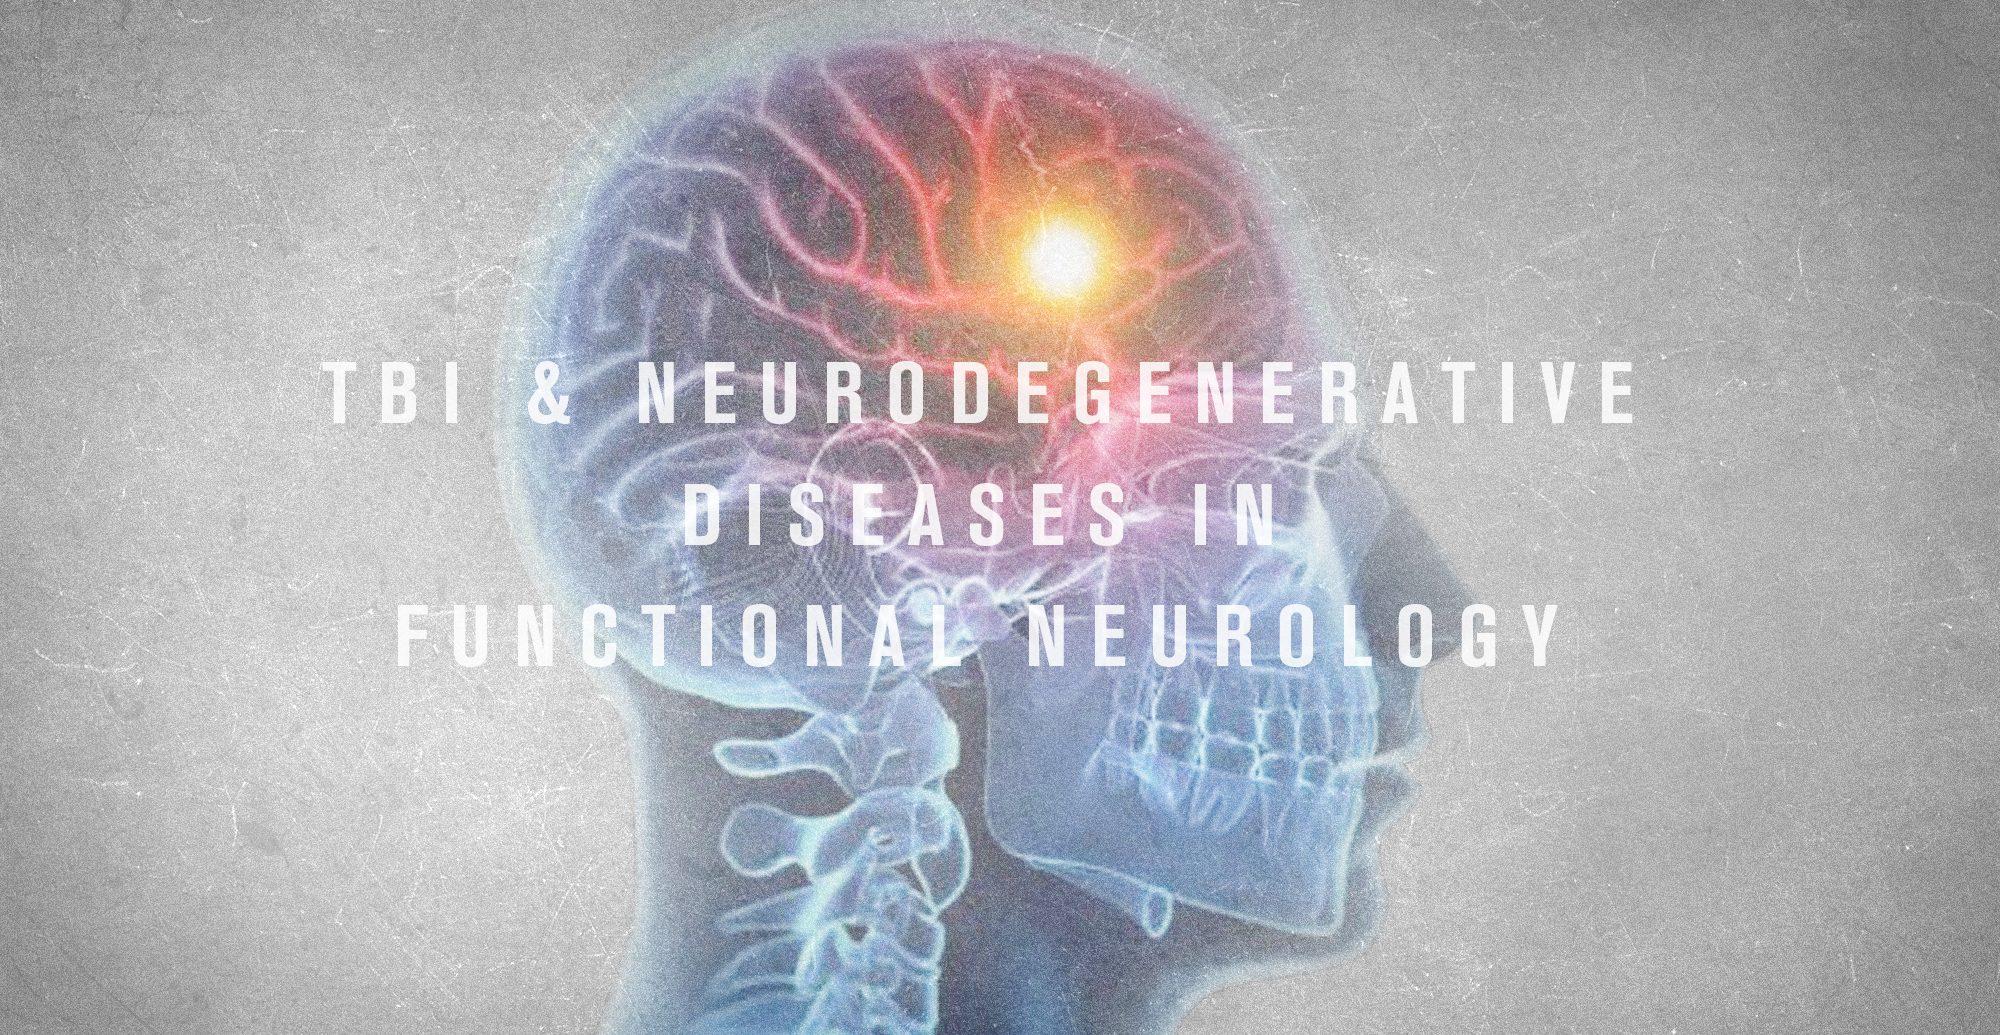 TBI e malattie neurodegenerative in neurologia funzionale | Chiropratico El Paso, TX